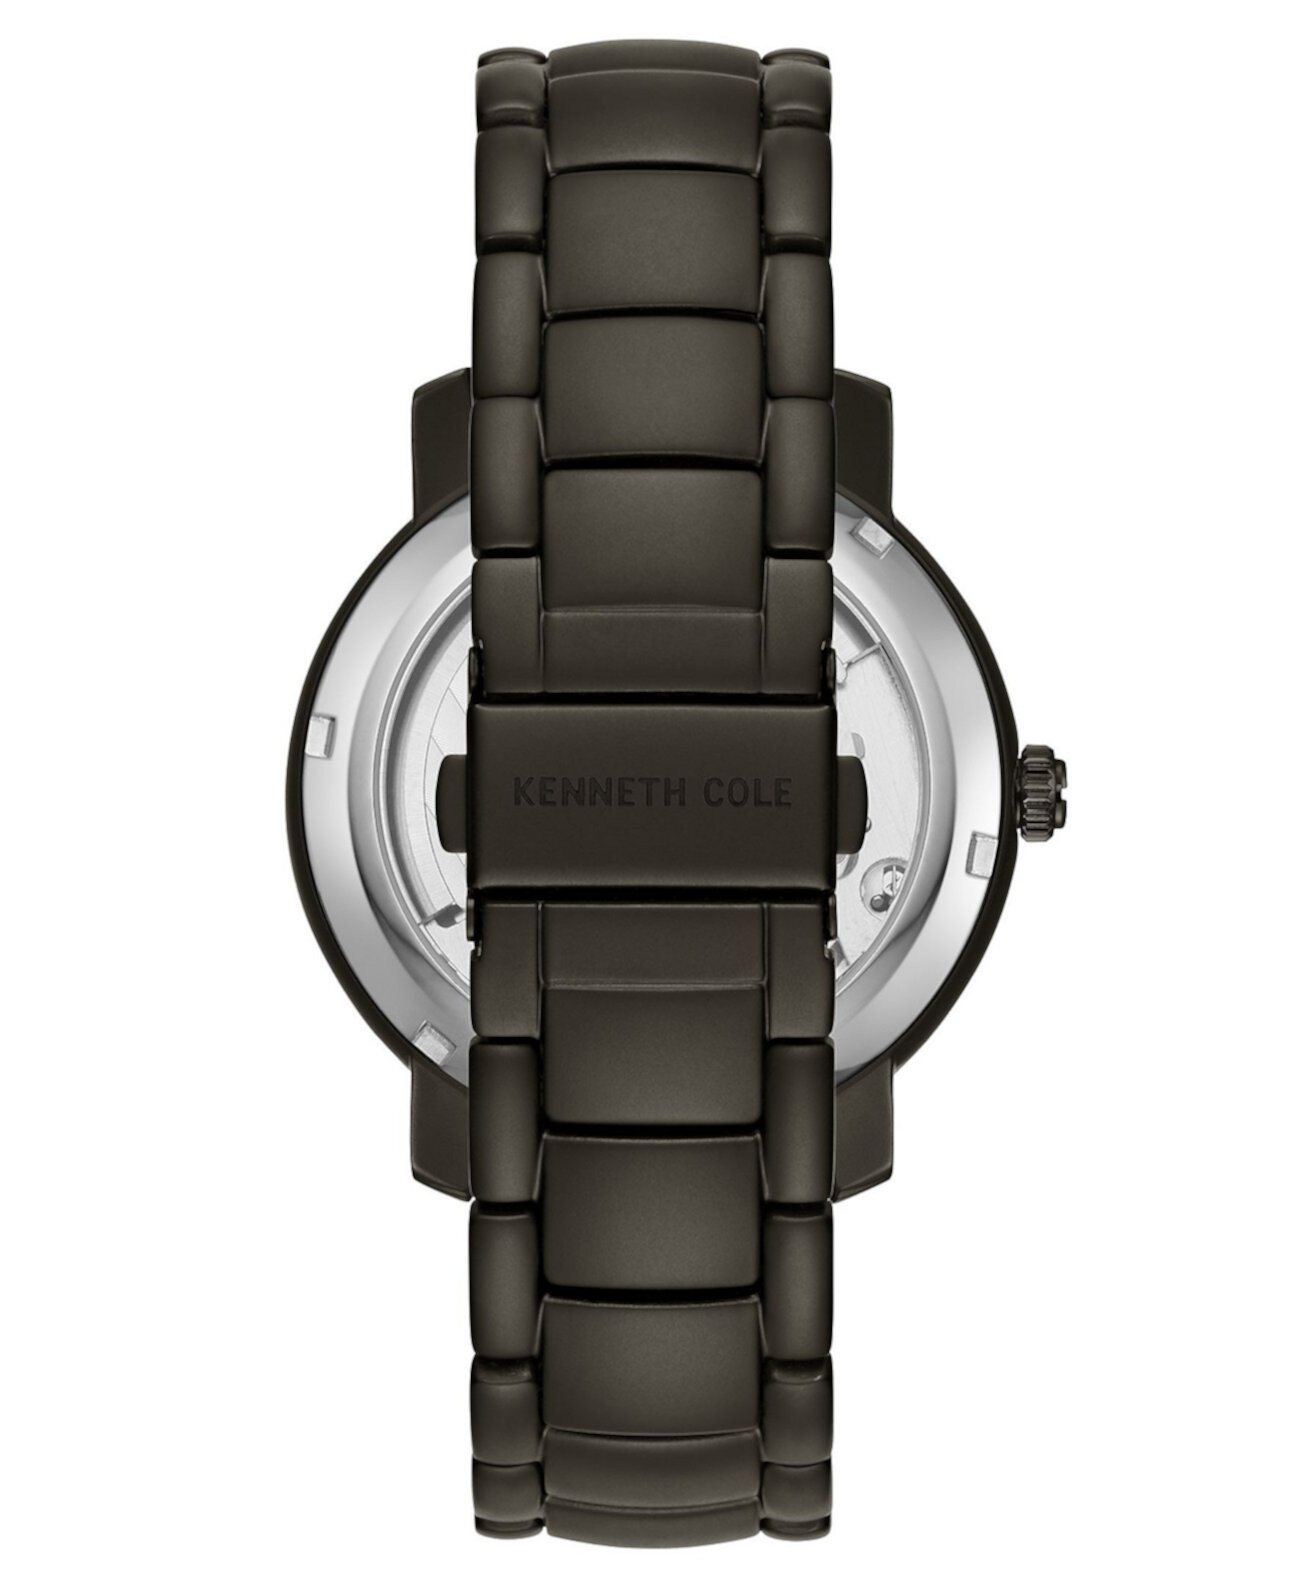 Мужские часы-браслет из нержавеющей стали, 42,5 мм Kenneth Cole New York